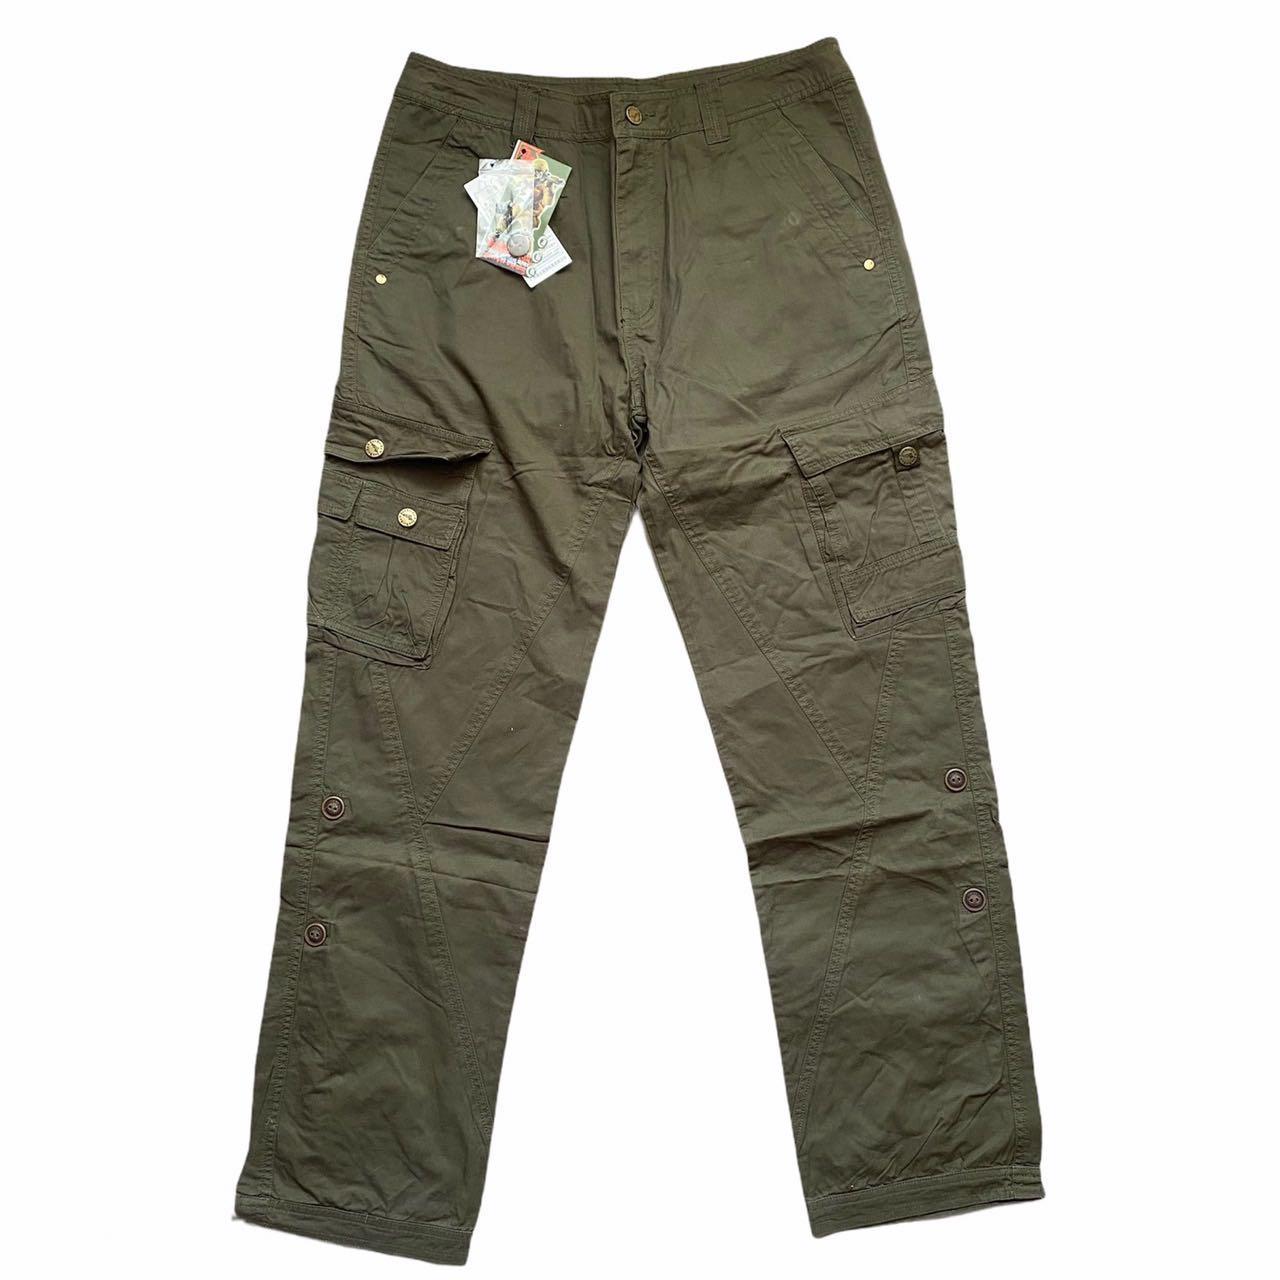 Convertible Military Cargo Pants